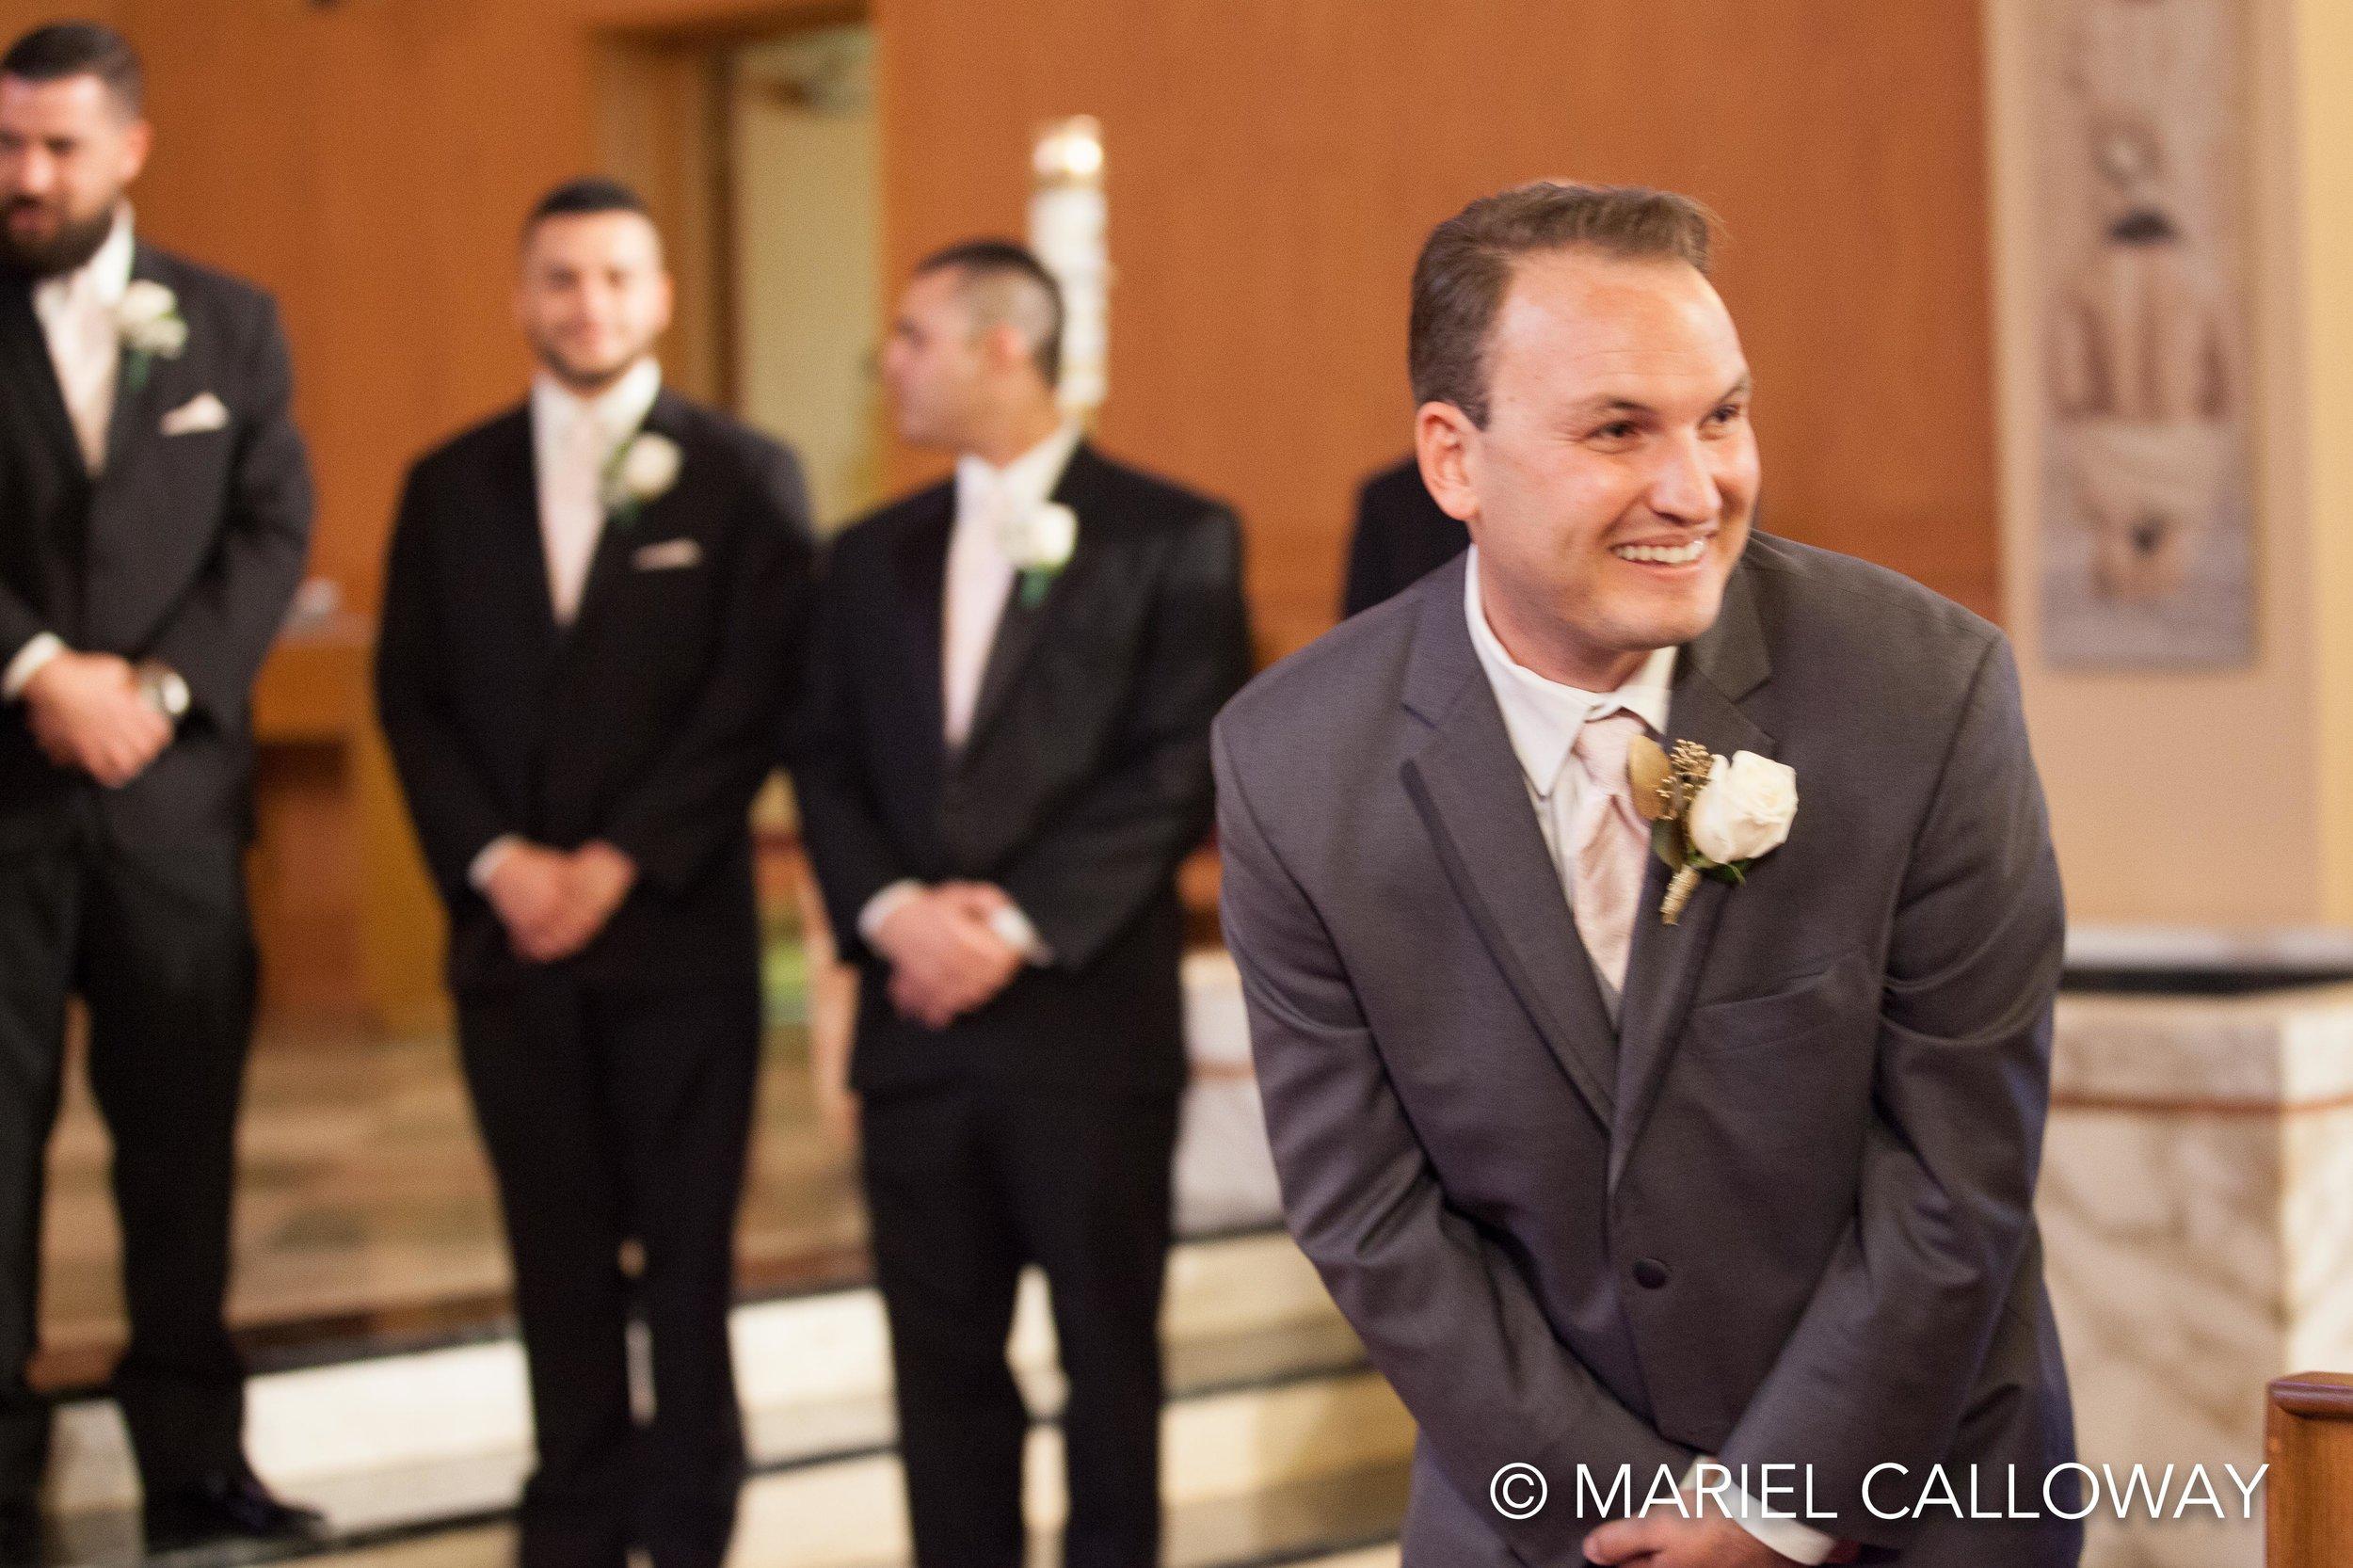 Mariel-Calloway-Los-Angeles-Wedding-Photography-Rossi-43.jpg